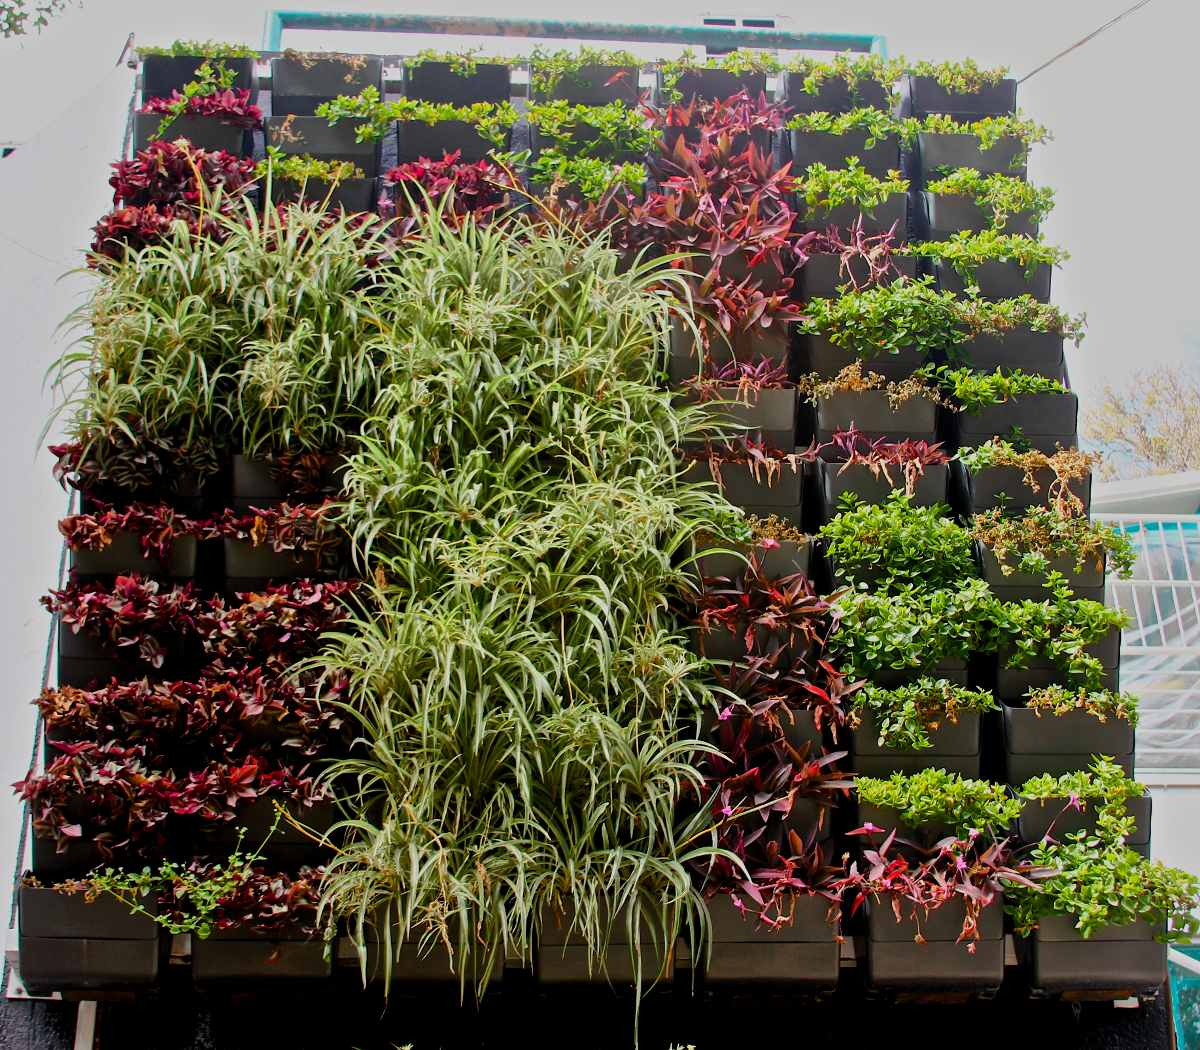 Jard n vertical muro verde huerto urbano dise o jardines for Jardin vertical mercadolibre